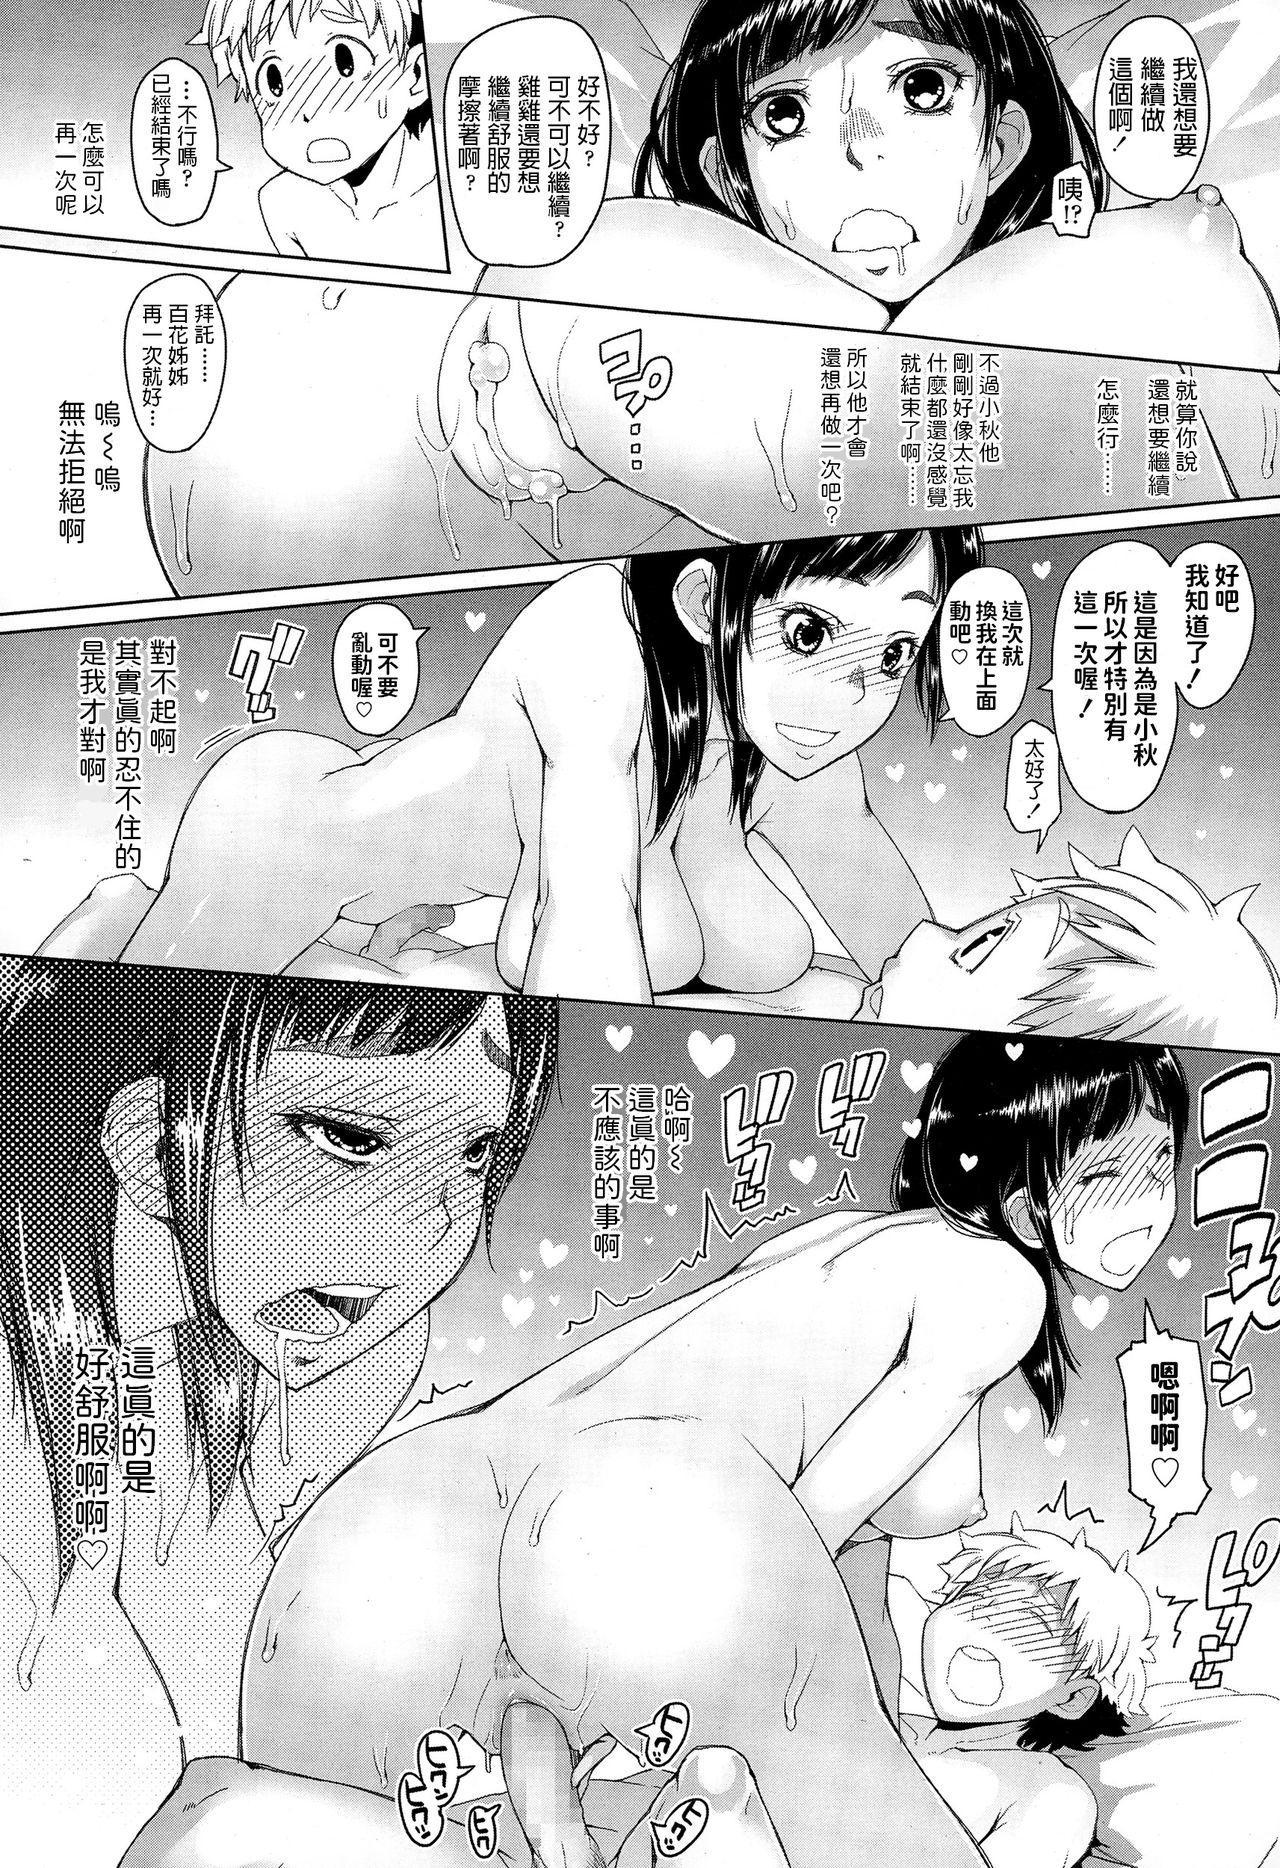 朝木貴行   女子高生のお留守番  COMIC 高 Vol.4  中文翻譯 11